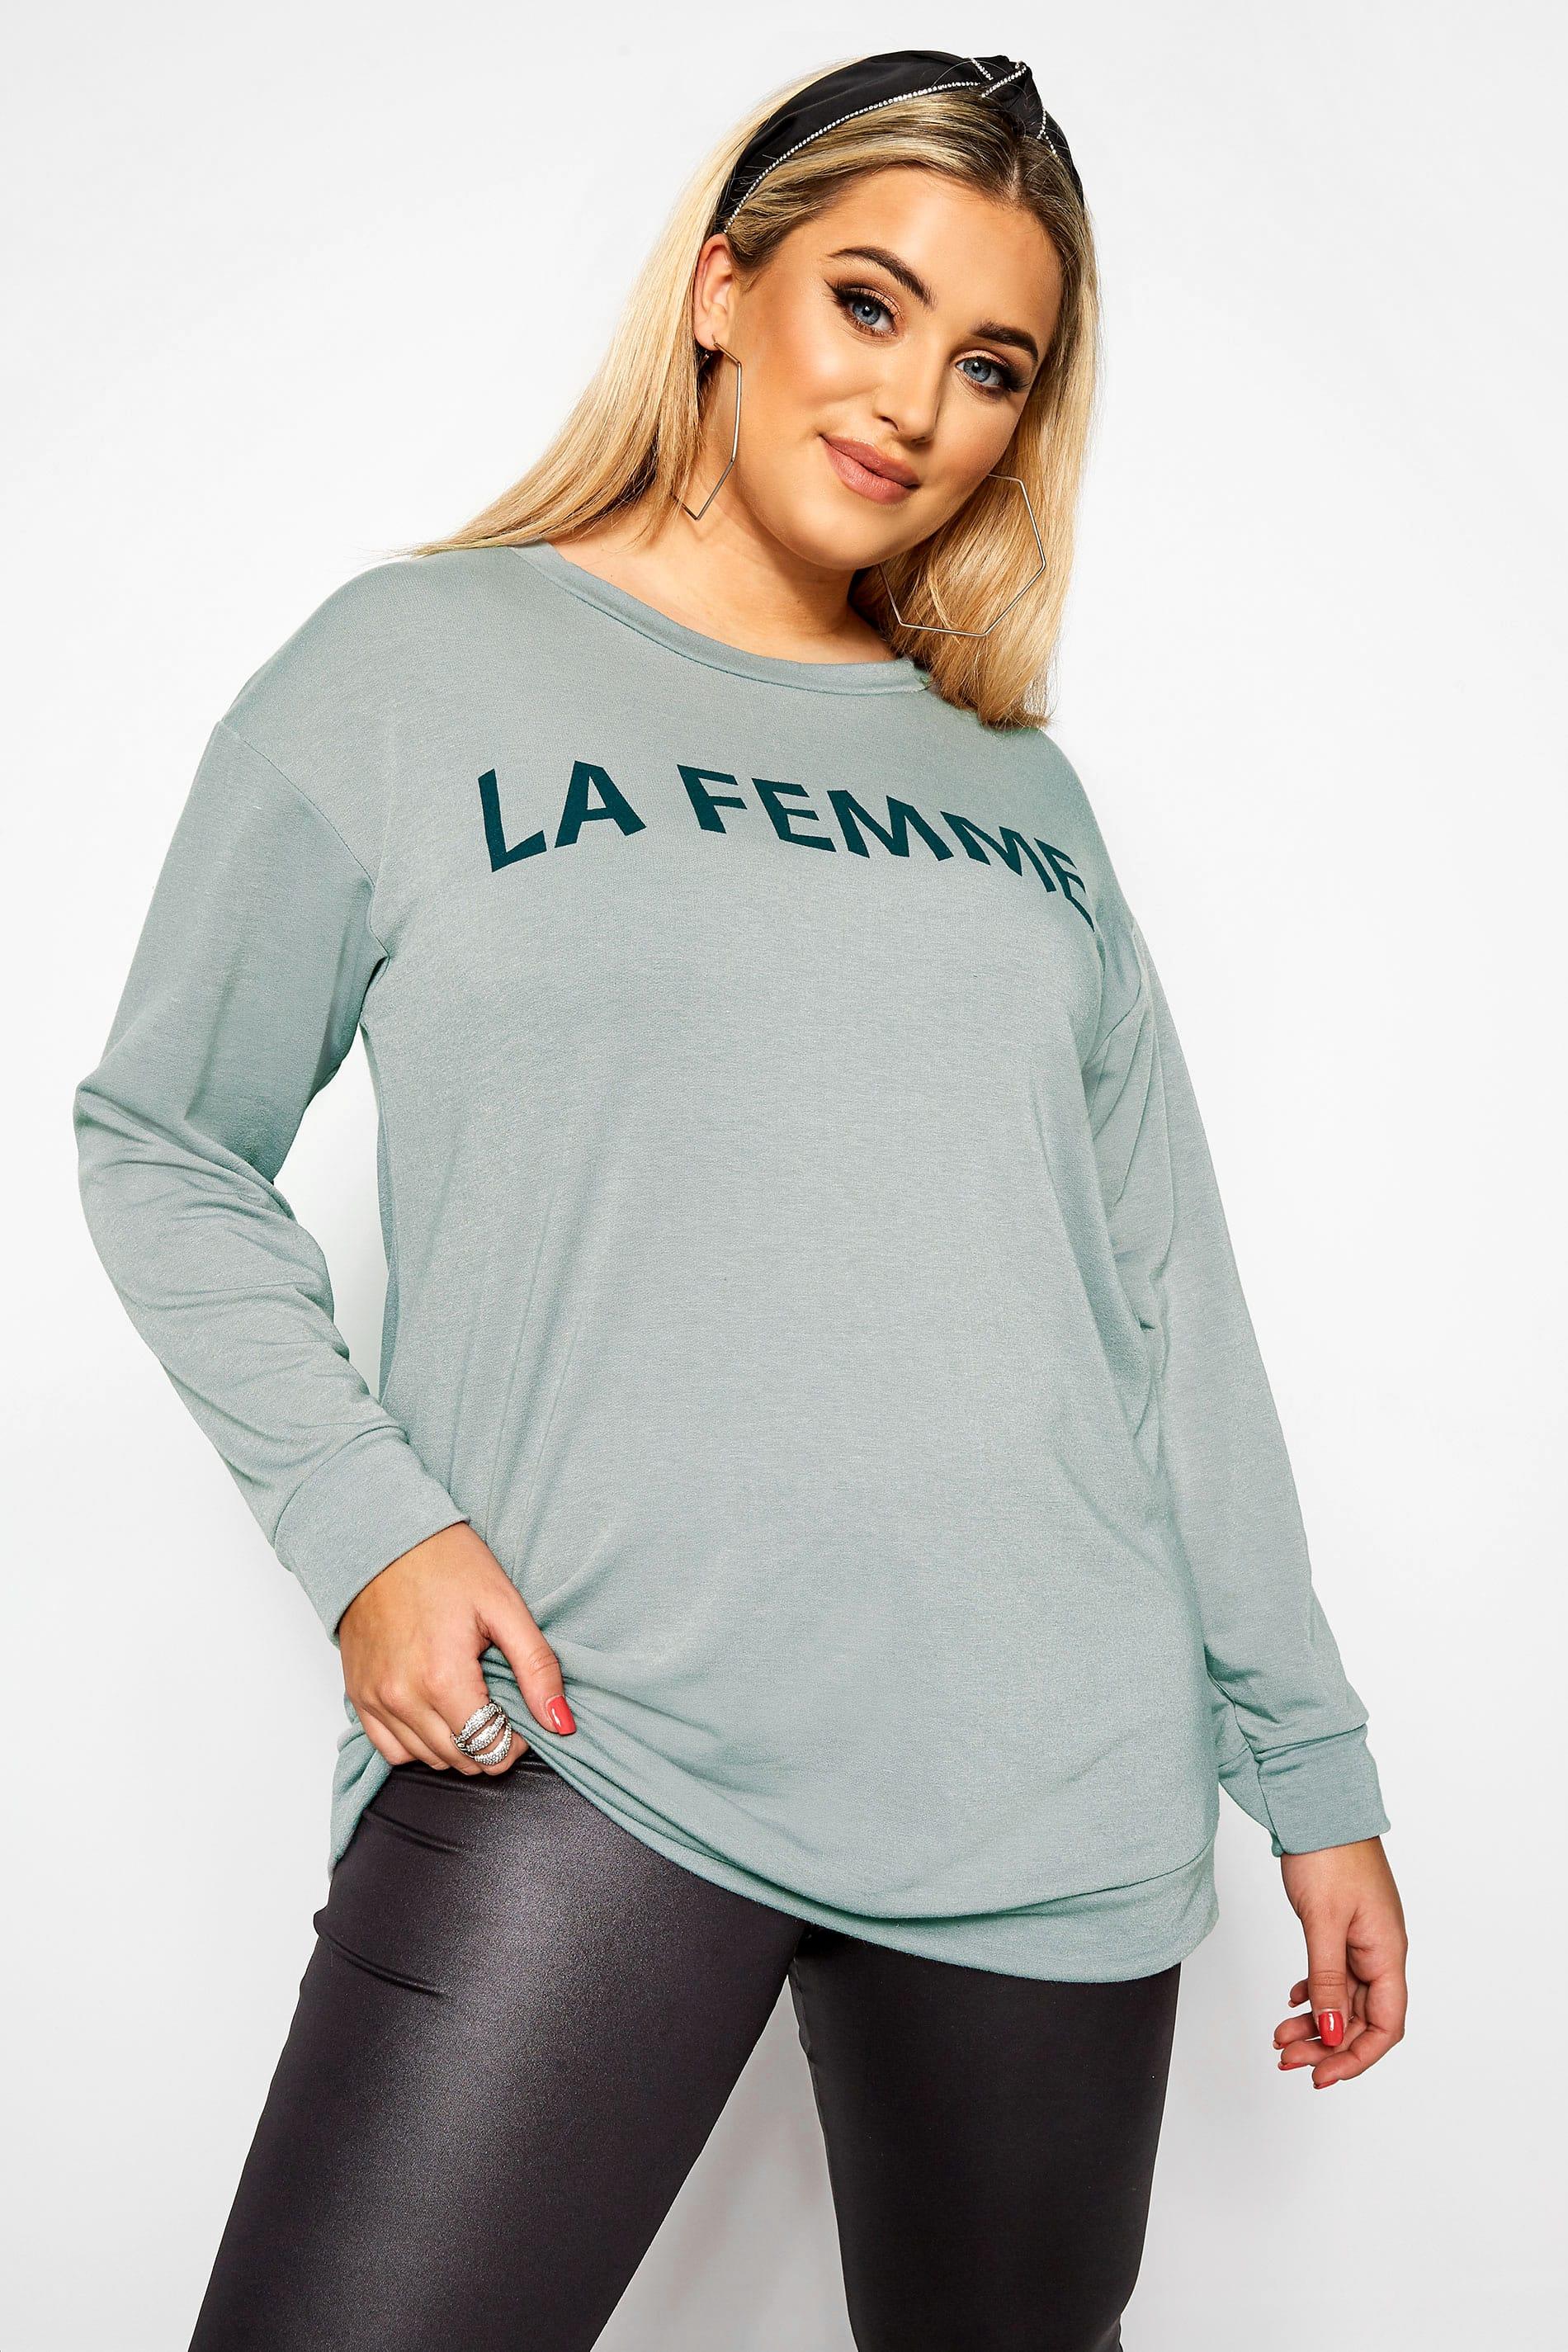 Grey 'La Femme' Slogan Sweatshirt